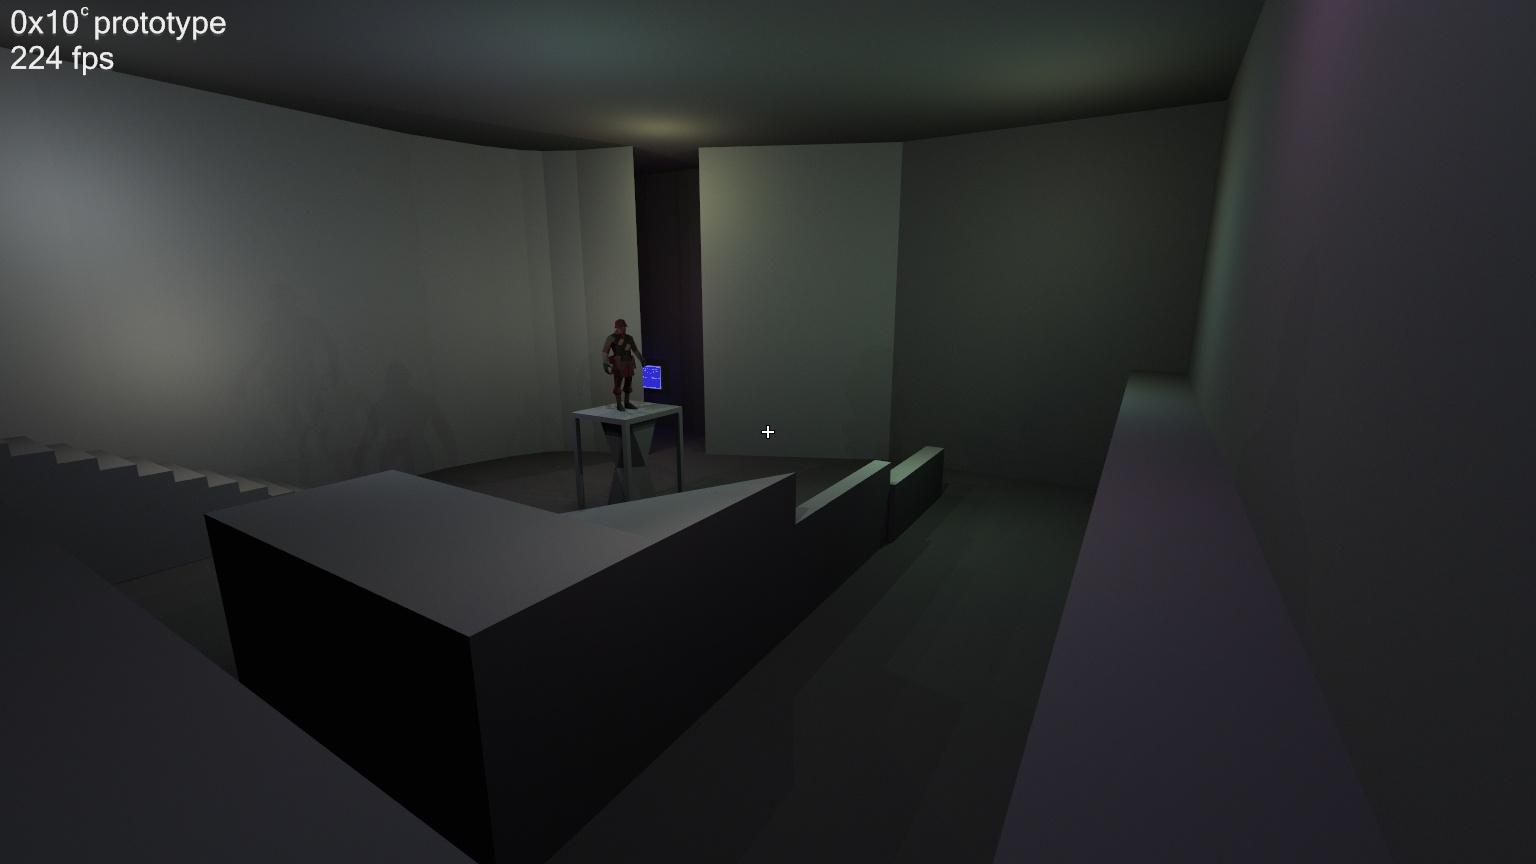 0x10c Prototype Screenshots - Blue's News